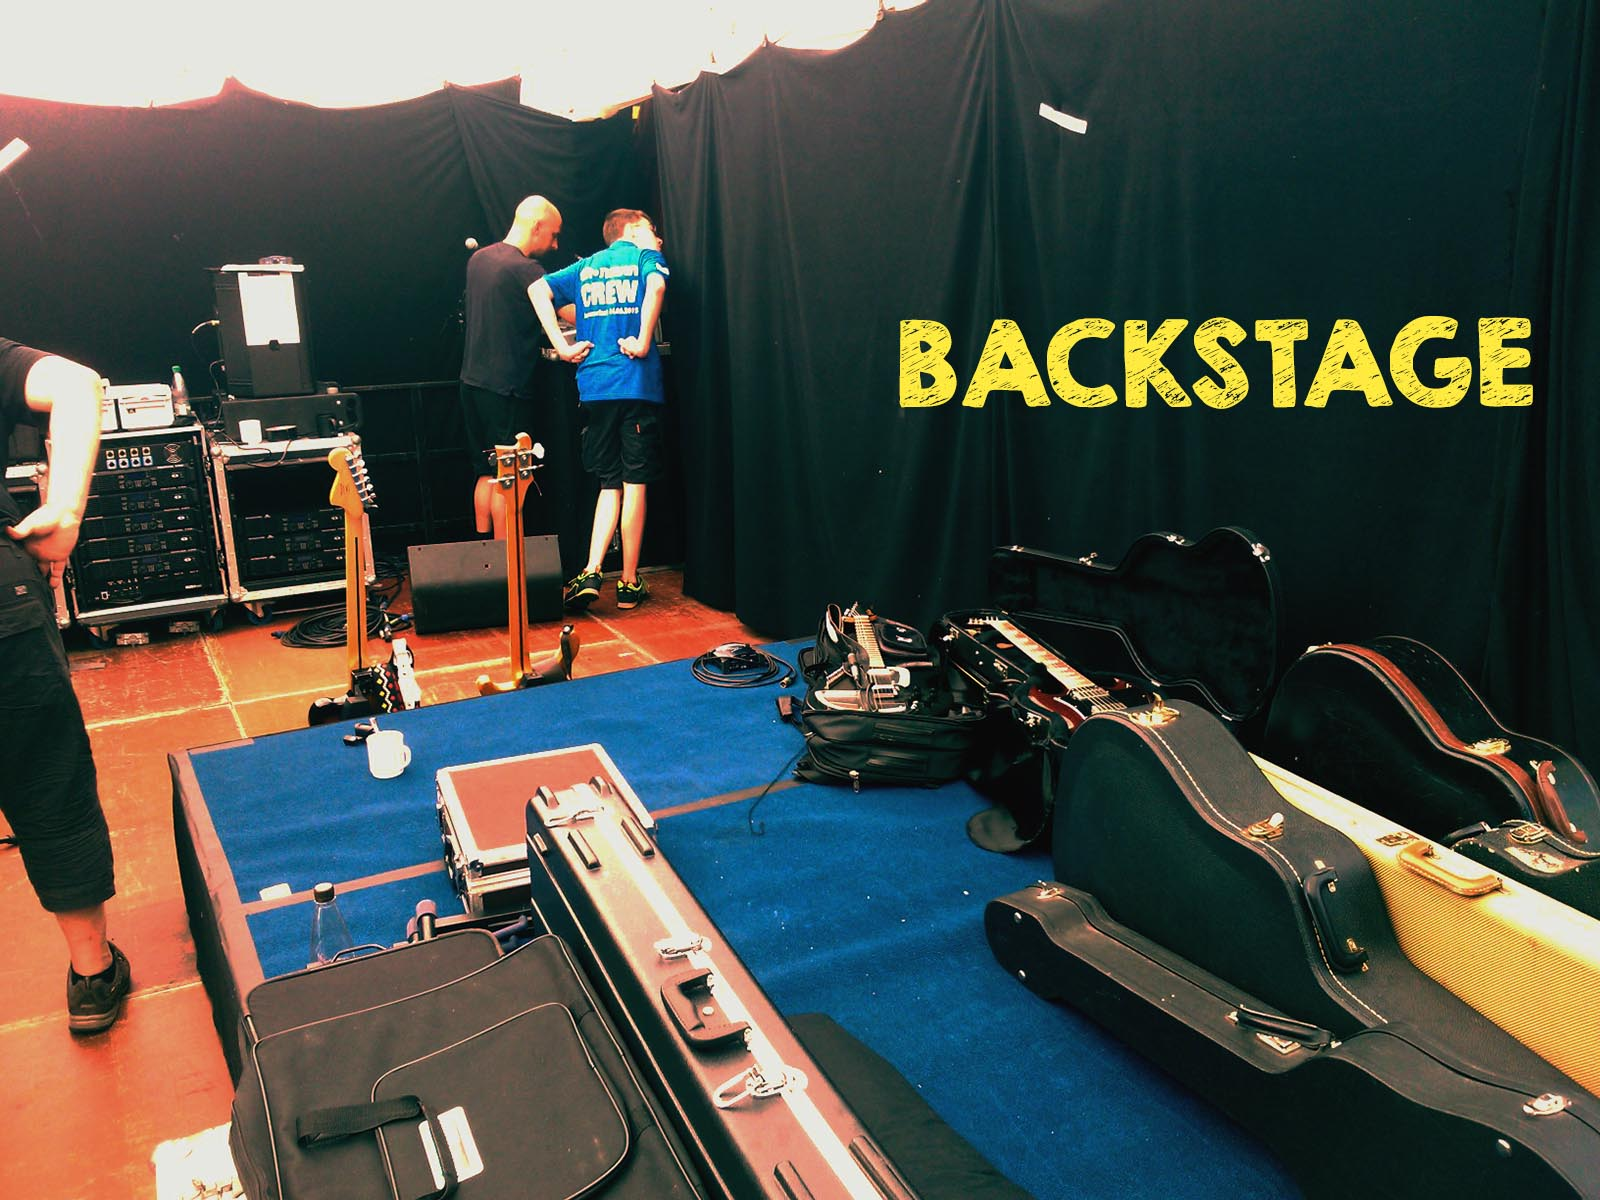 sommerfest-2015-backstage-kiriakosgp-01